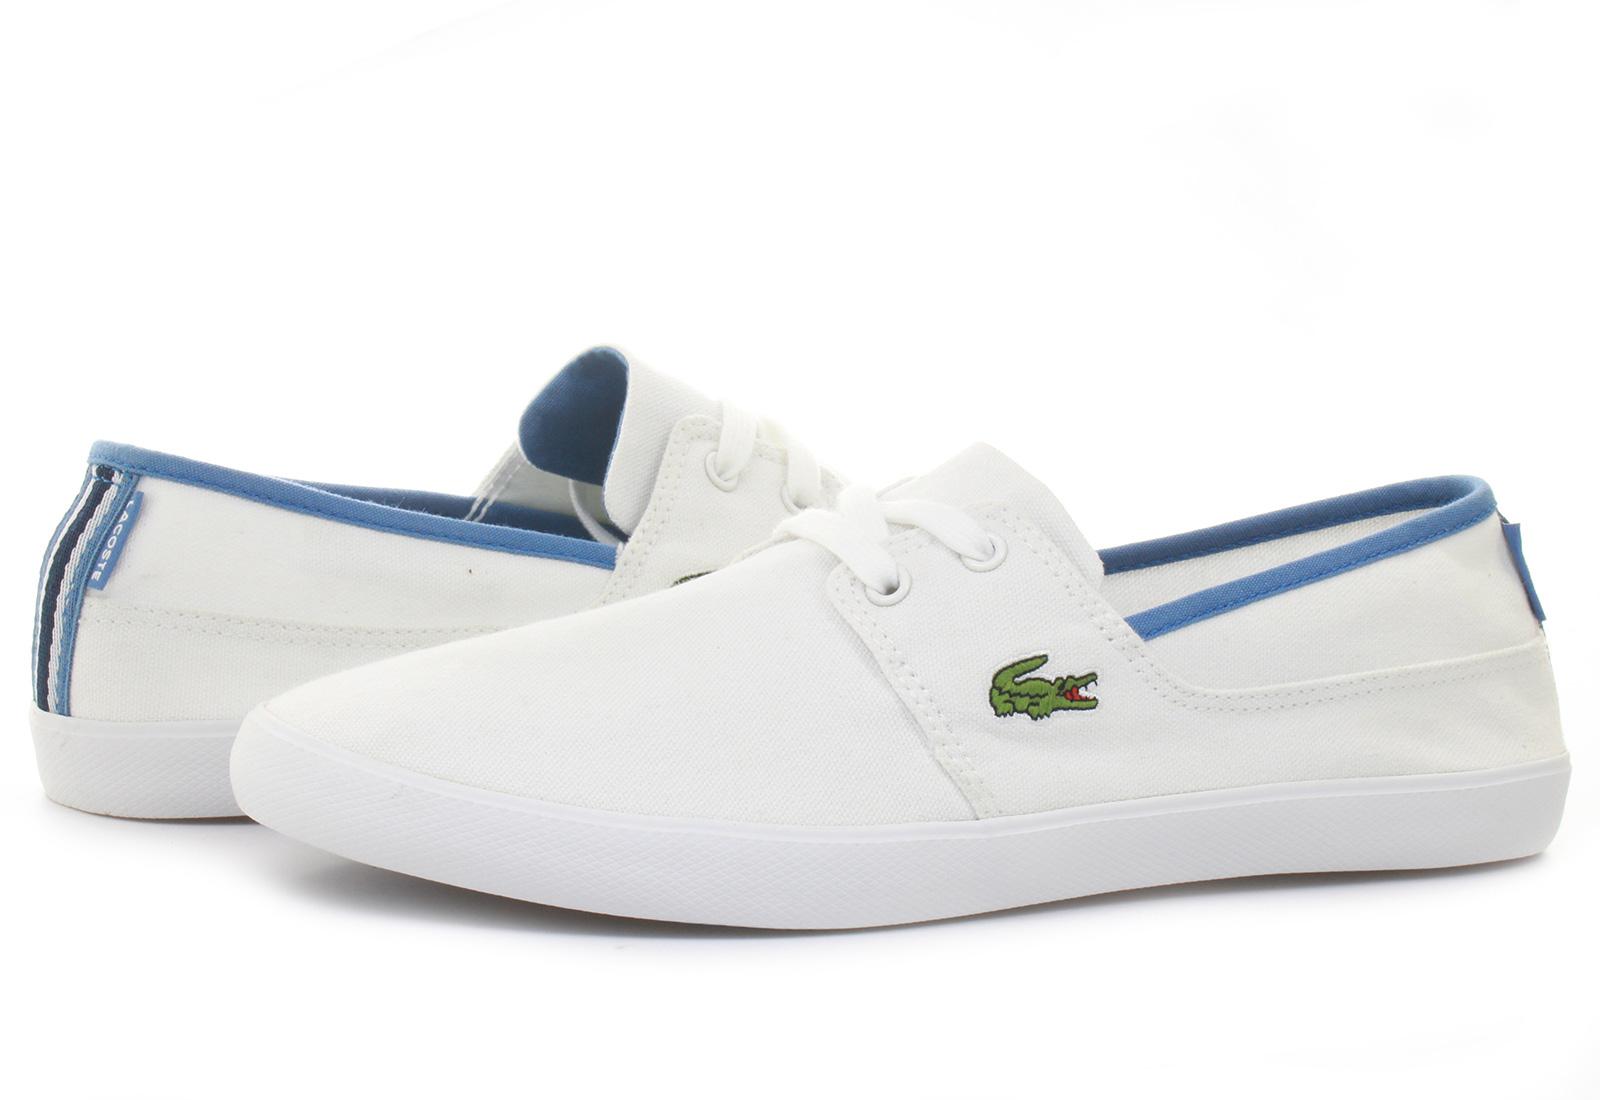 Lacoste Shoes - Marice Lace - 142spm3003-21g - Online shop for ... ff078b9671